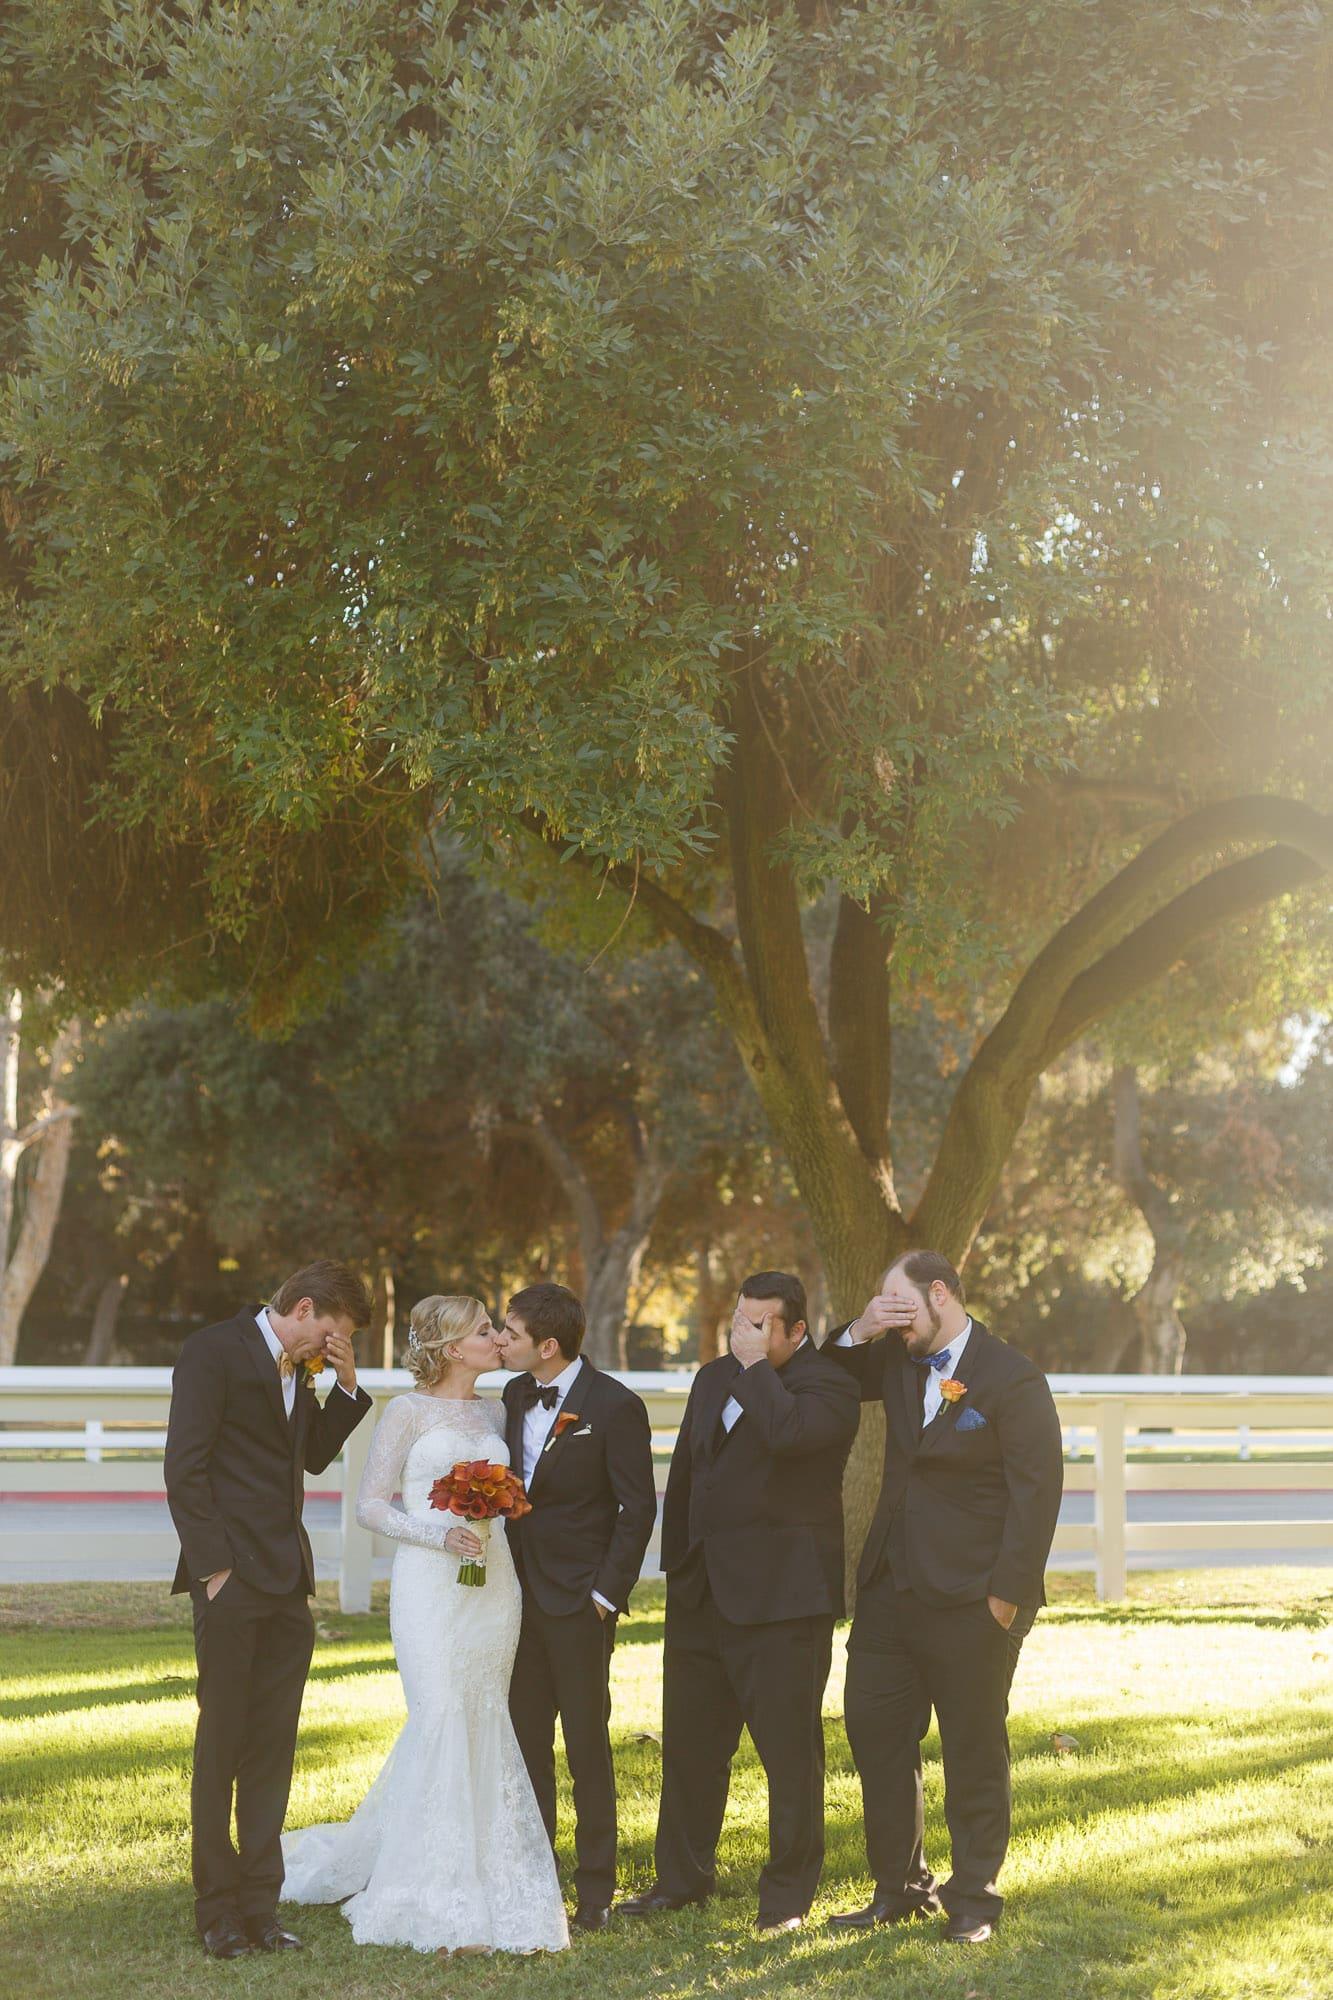 026_Alan_and_Heidi_Los_Angeles_Equestrian_Center_Wedding